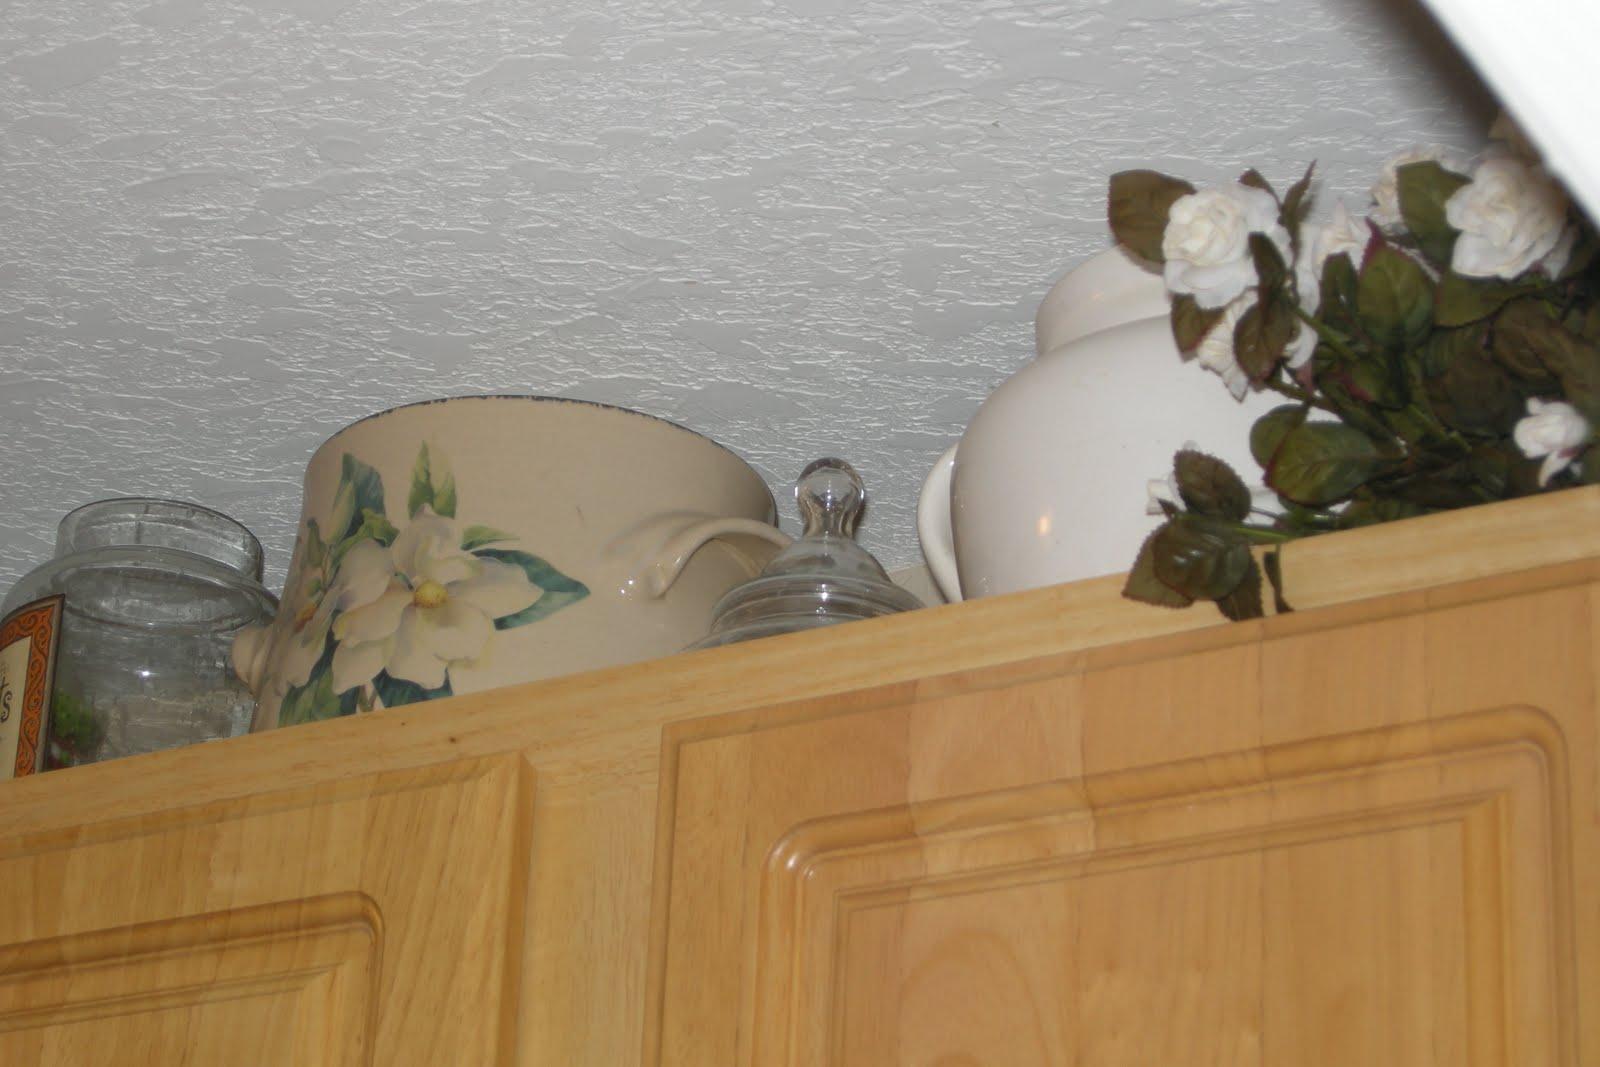 http://4.bp.blogspot.com/_ZWHi2fYLaV4/TH8BMDtqxWI/AAAAAAAABUo/IJog5WY_Co8/s1600/Wallpaper+up+in+laundry+room+(7).JPG